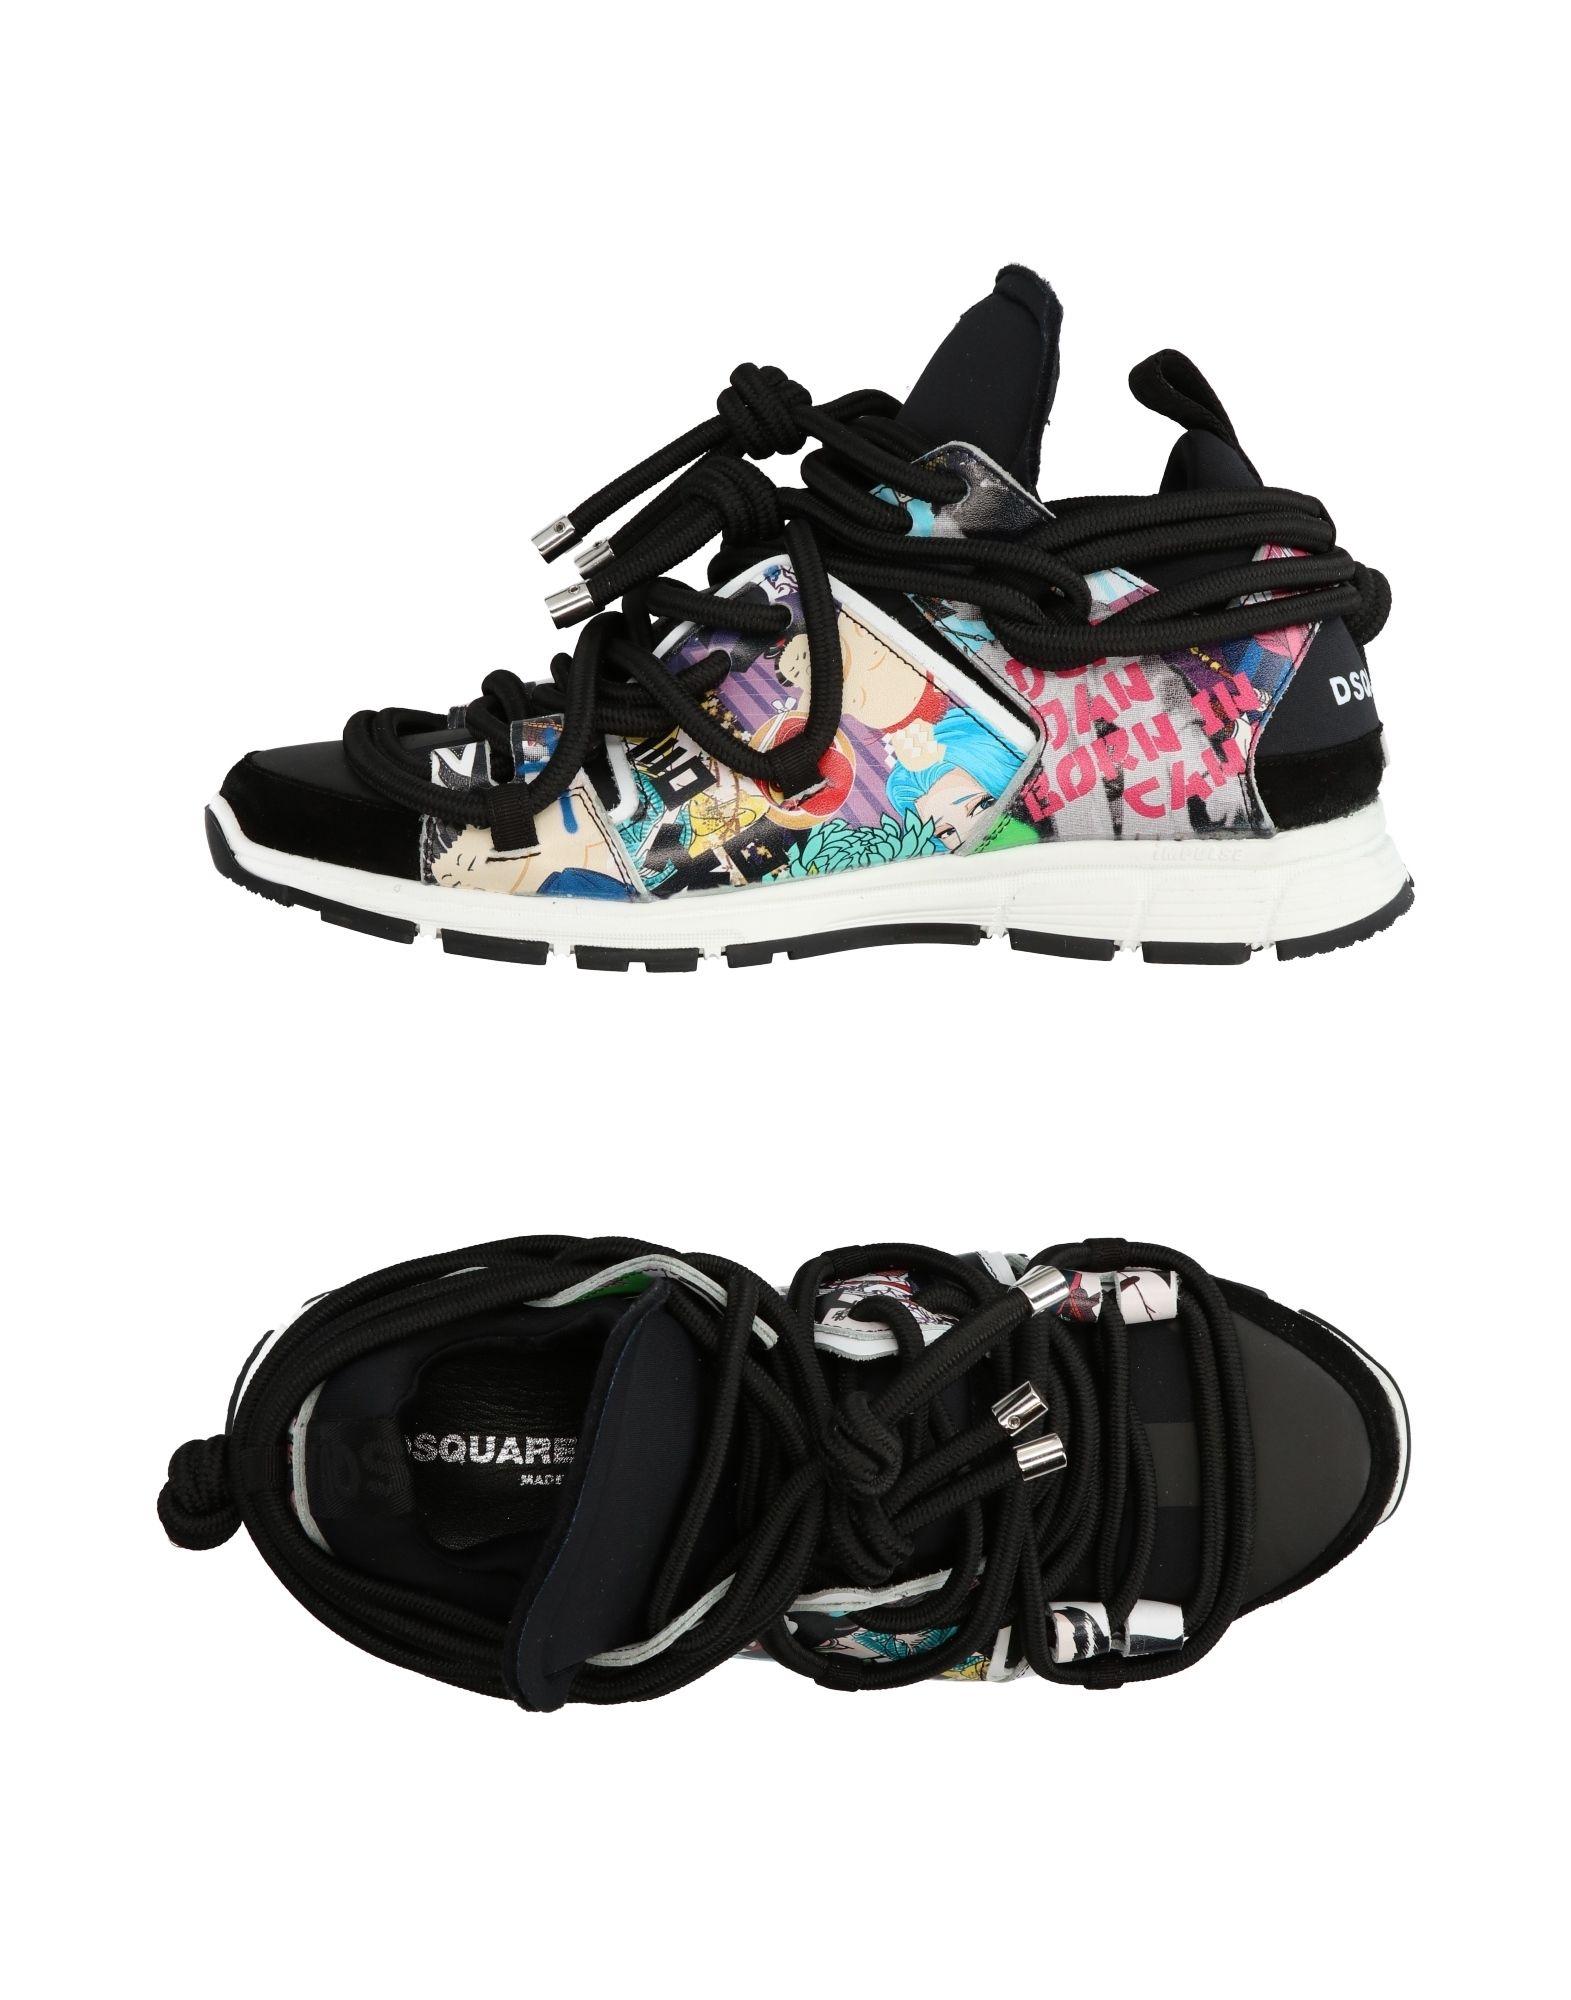 Dsquared2 Sneakers Herren  beliebte 11298703II Gute Qualität beliebte  Schuhe 18a828